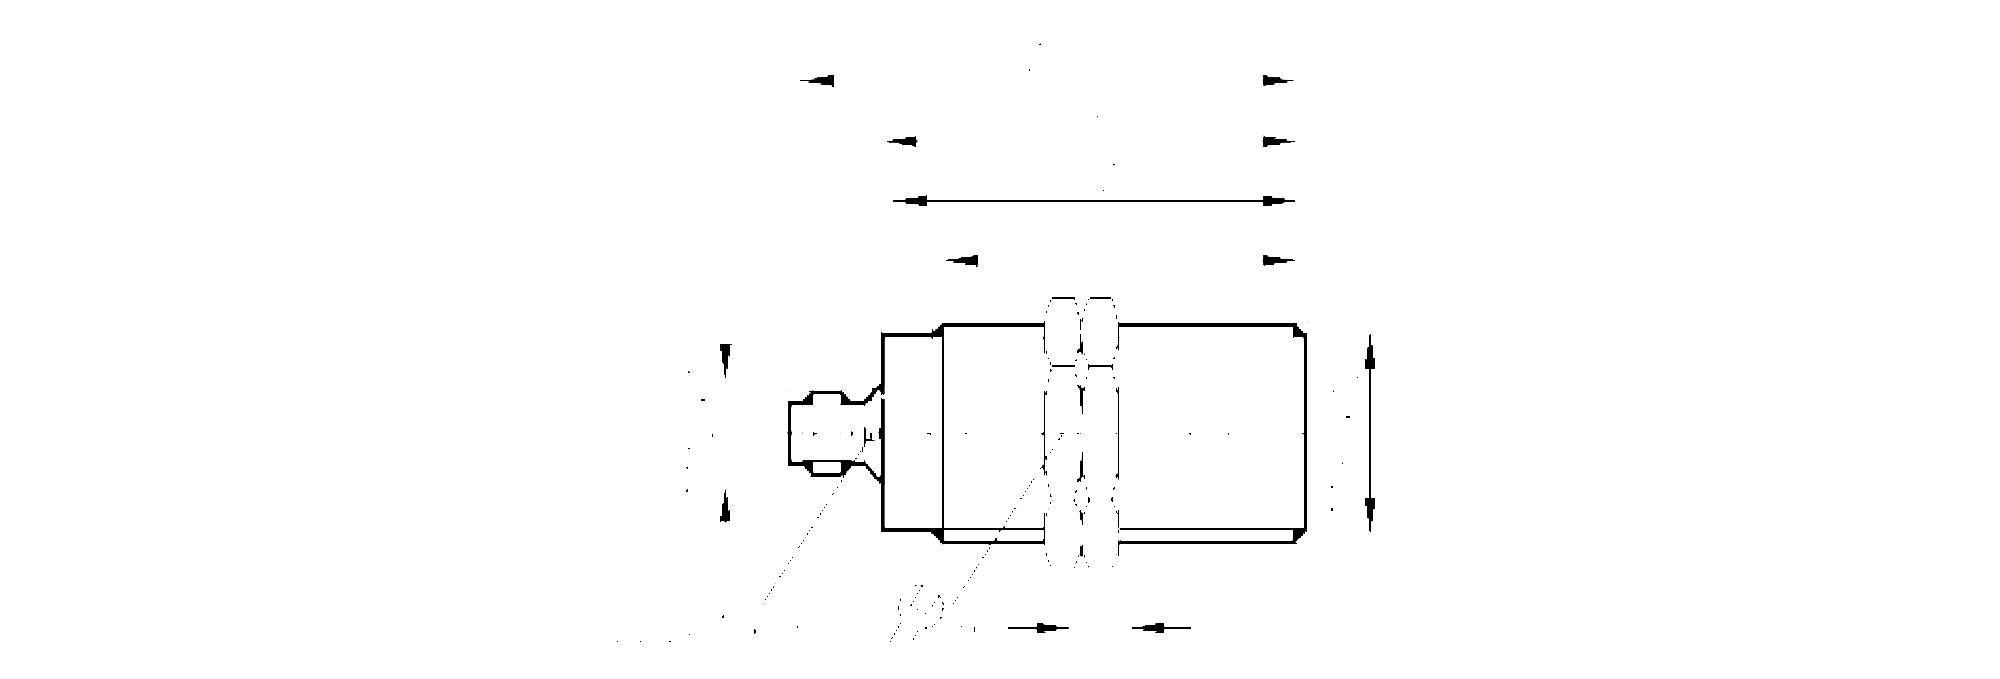 iir202 - inductive full-metal sensor